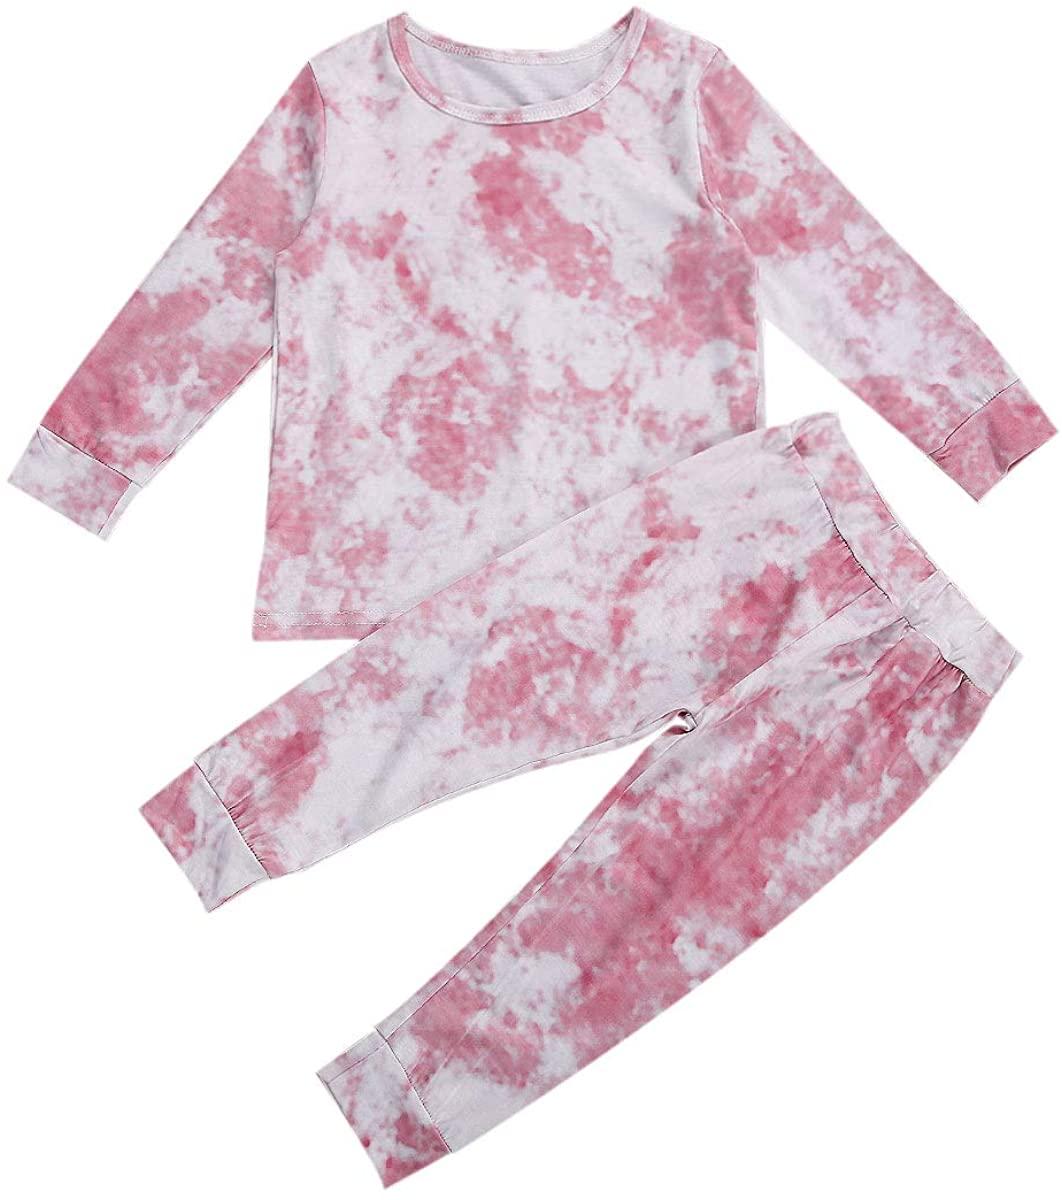 Zamons Toddler Baby Girl Boy Fall Winter Tie-Dye Clothes Outfits Long Sleeve Tops Pants 2PCS Pajamas Set